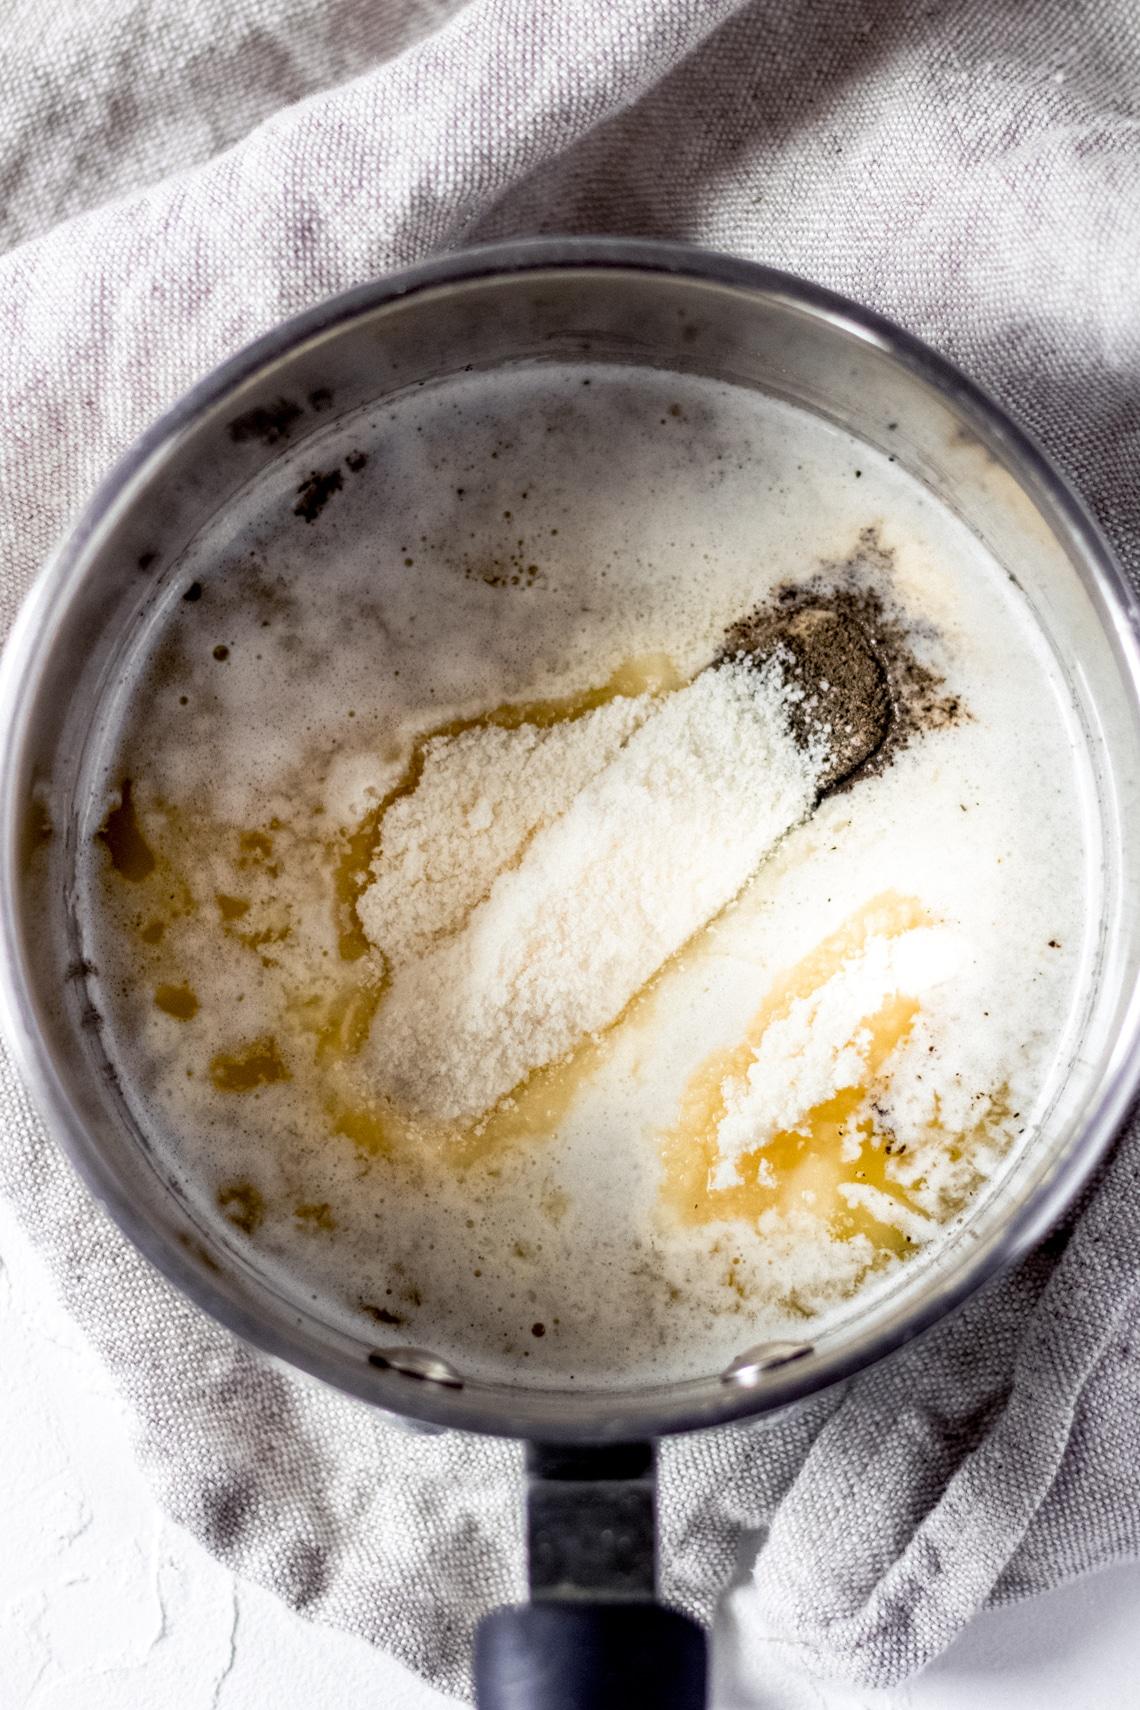 garlic parmesan sauce melting in a saucepan